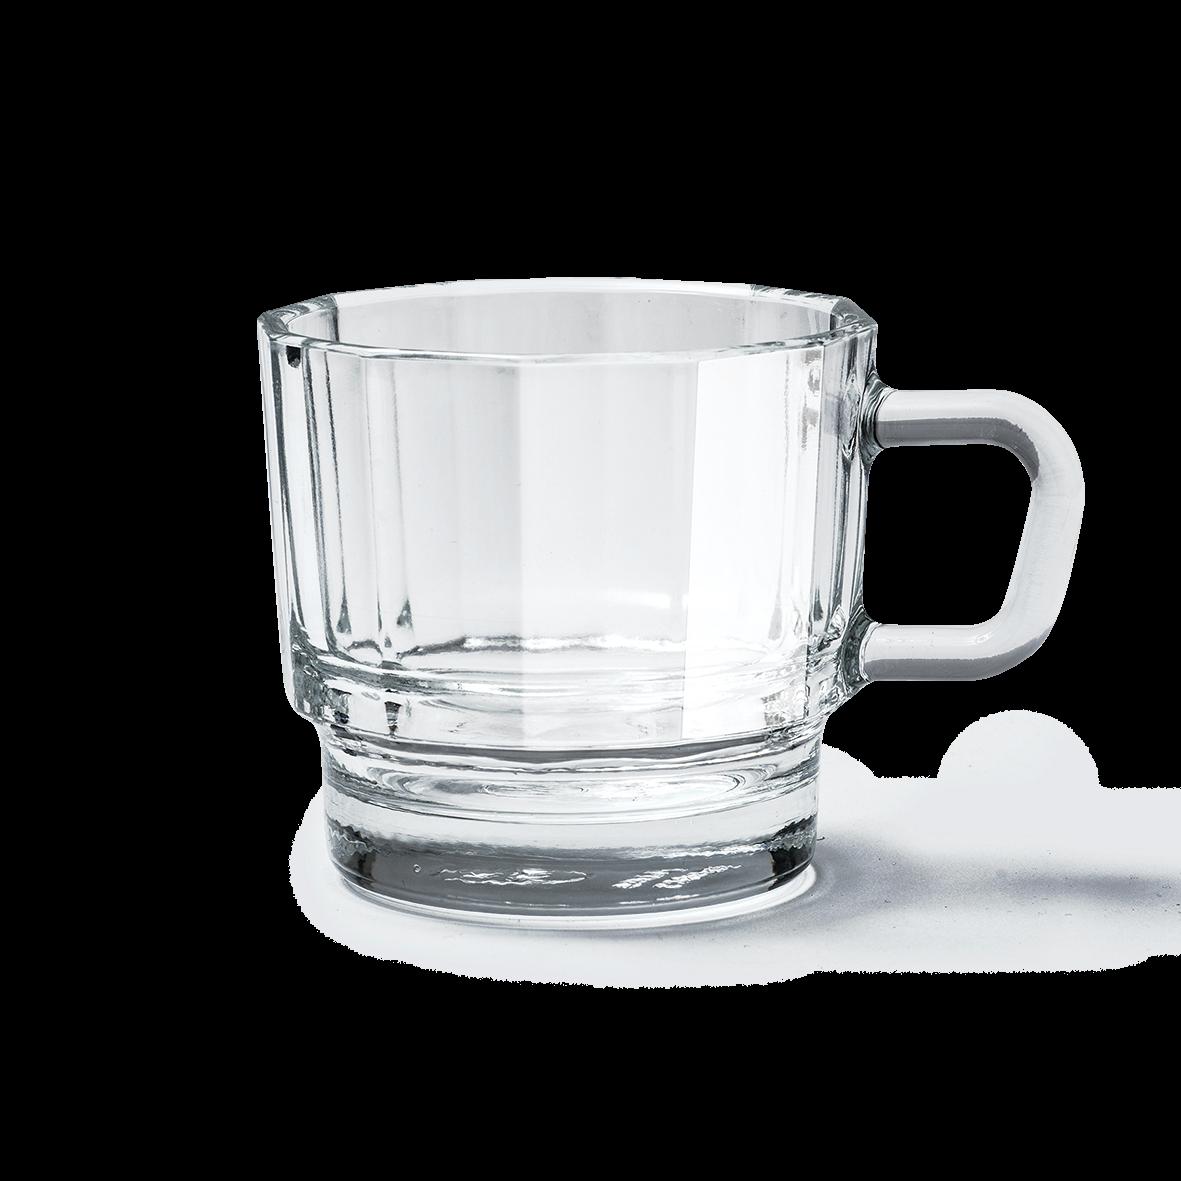 W Glass Coffee Cup Gessato Design Store